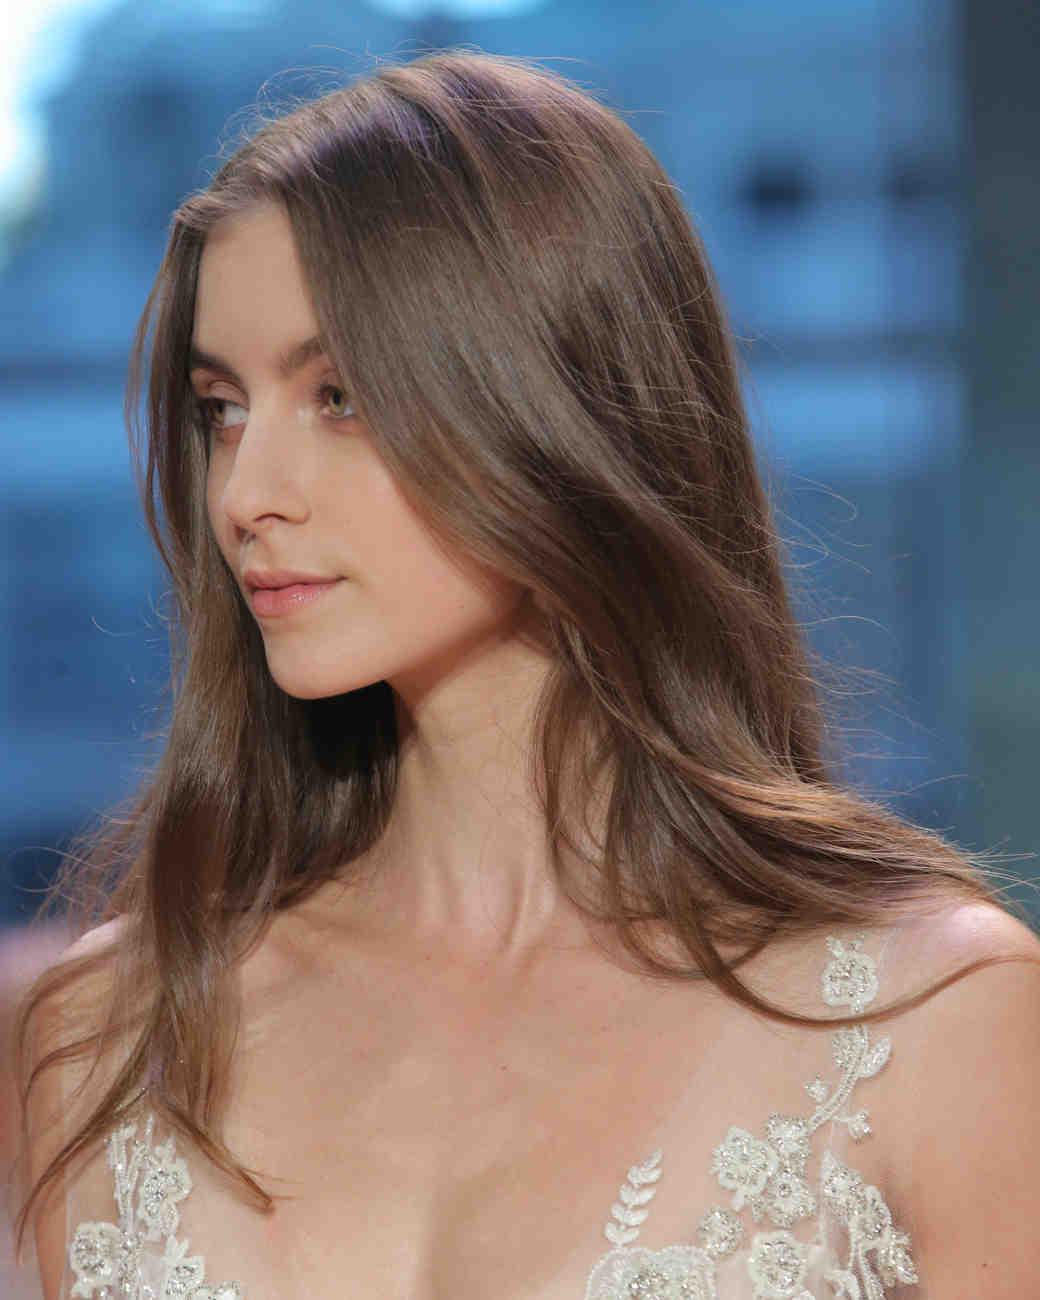 monique_lhuillier-fall2017-hair-front-1-1016